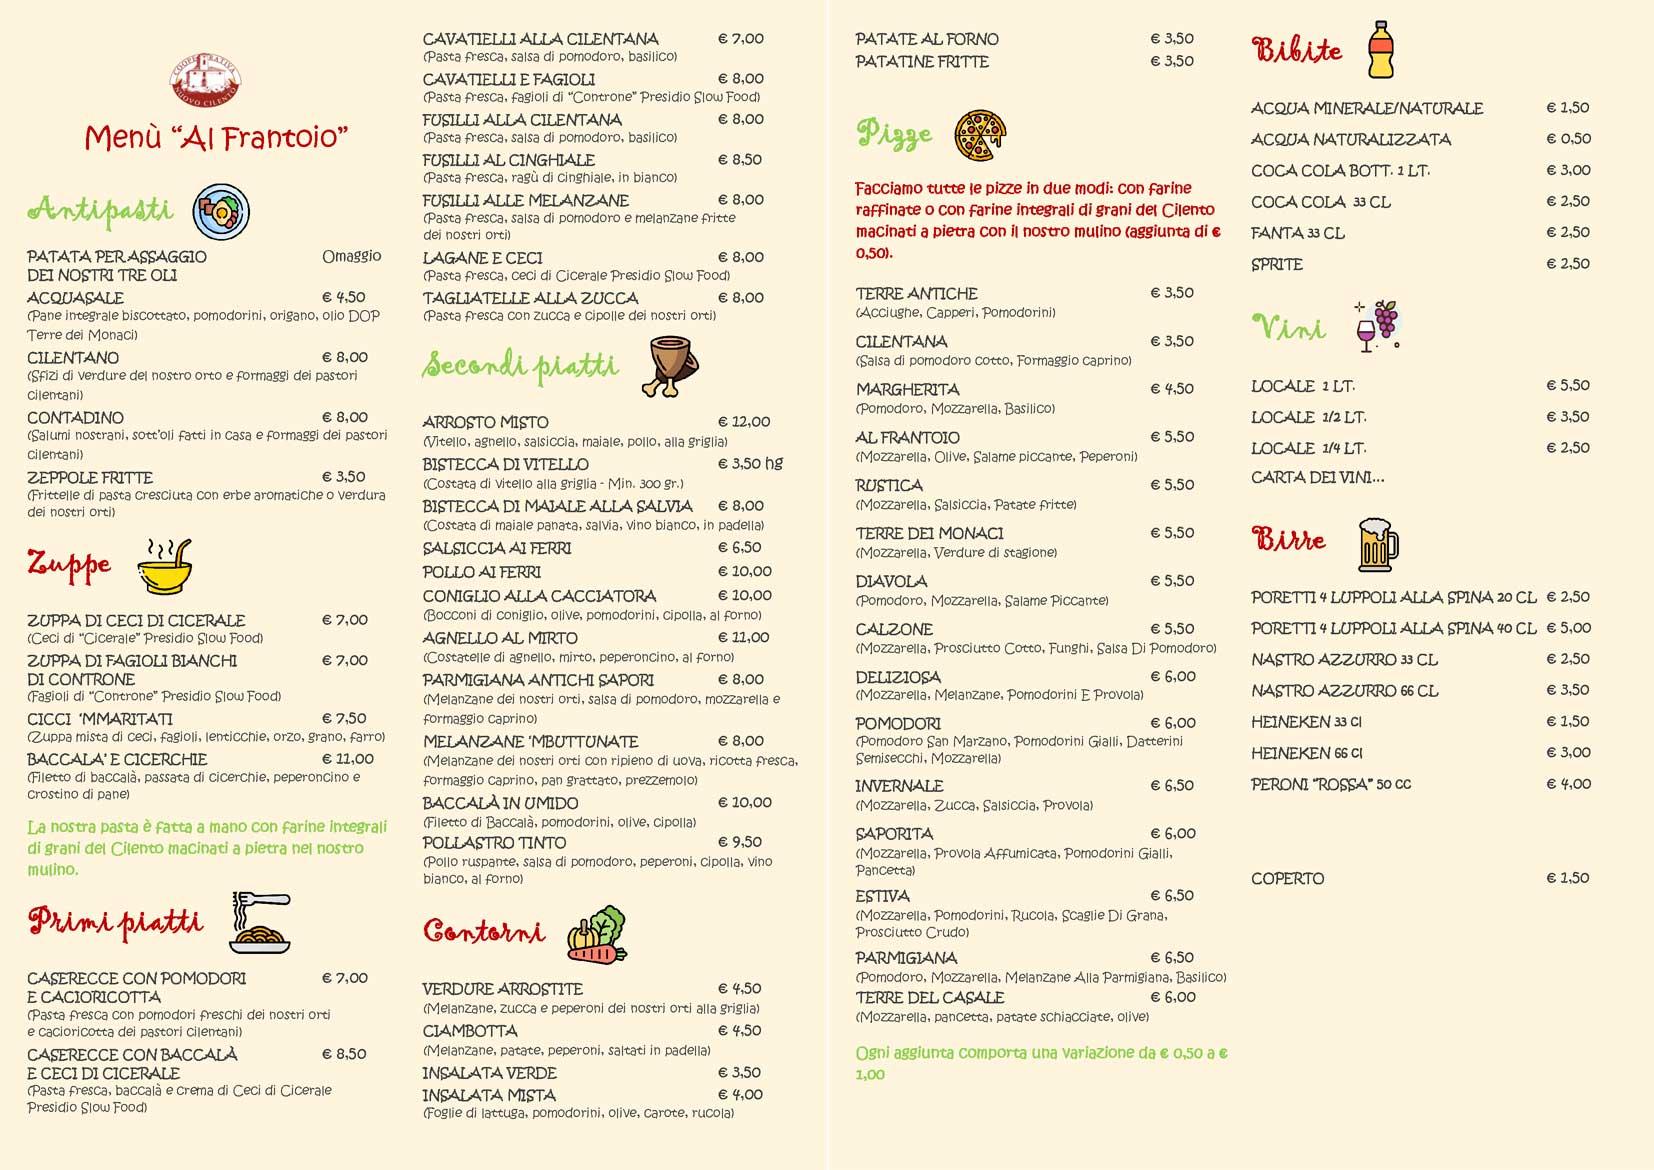 menu inverno 2020 ristorante al frantoio